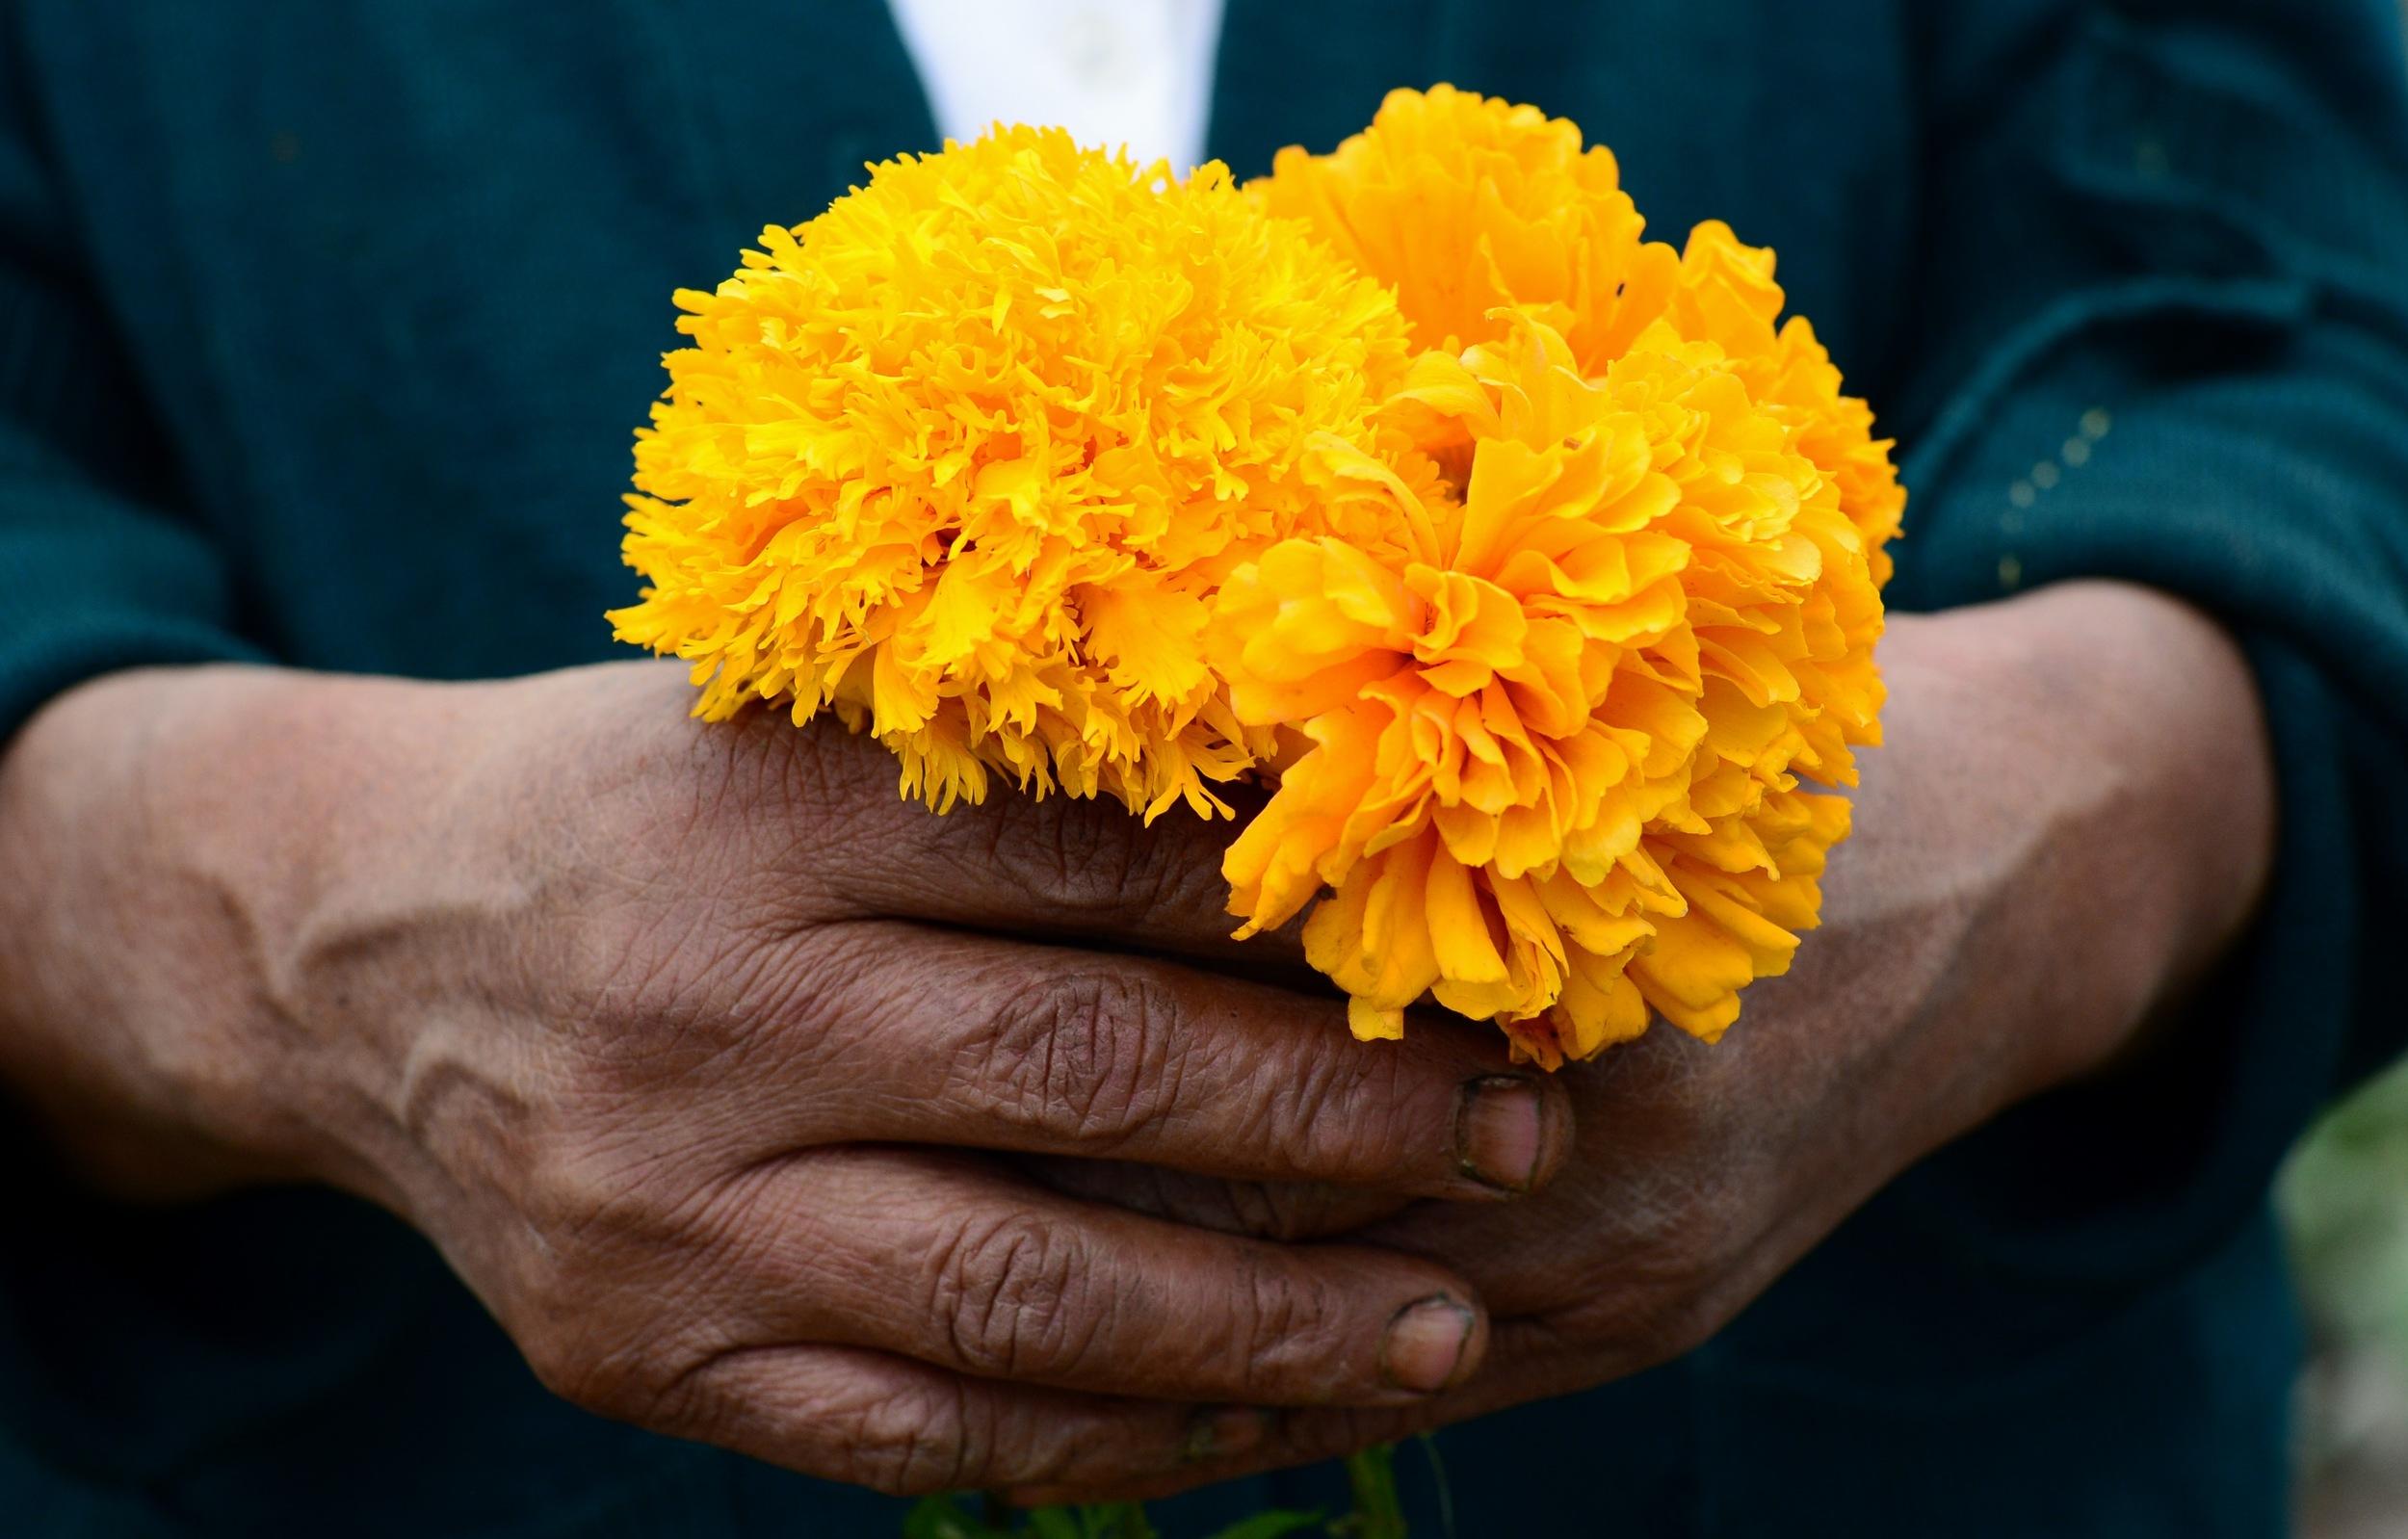 Source: Wikipedia,  cempauchil  (marigold) the traditioanl flower used to honor the dead